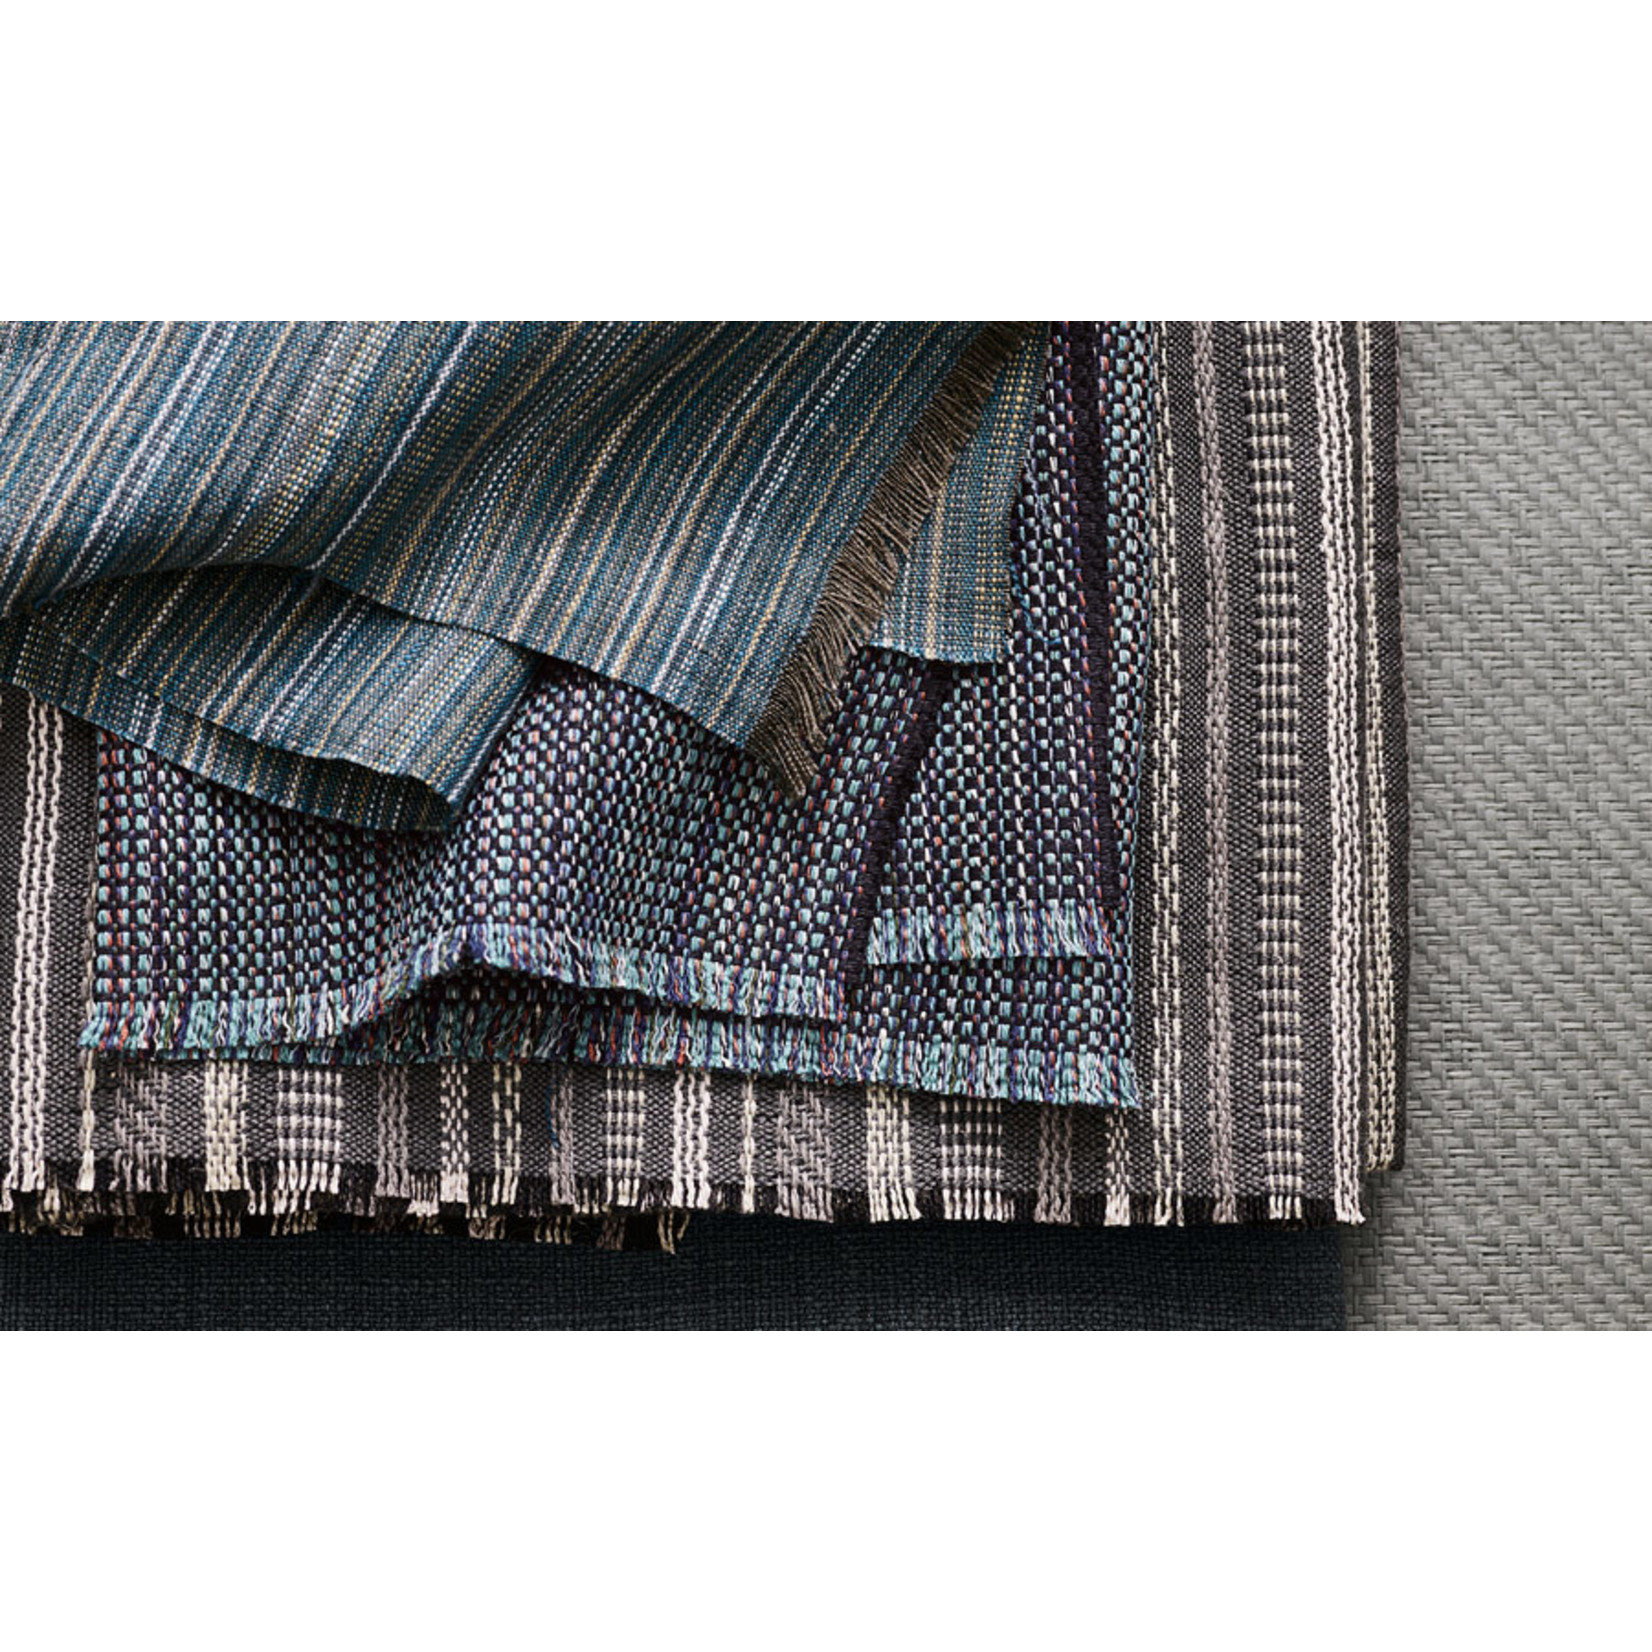 Mark Alexander Paperweave Handwoven Wallcoverings | Papier Atlantic